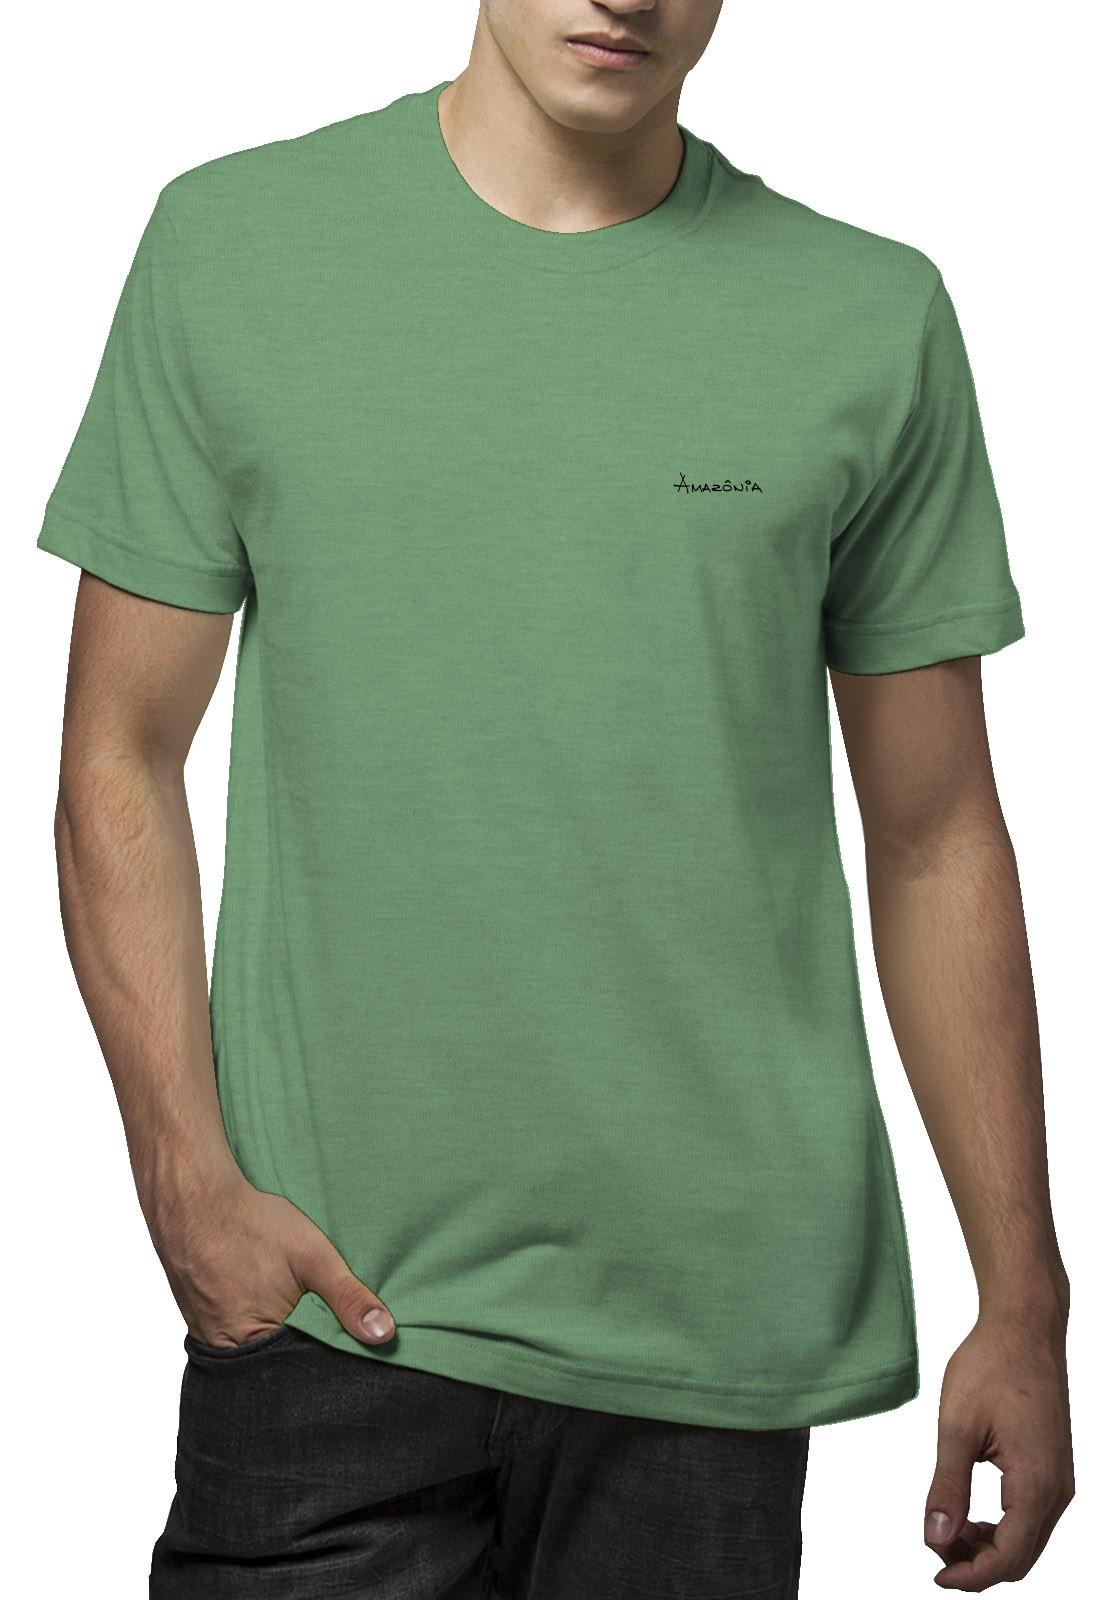 Camiseta Amazônia Paz e Natureza - Mescla Verde